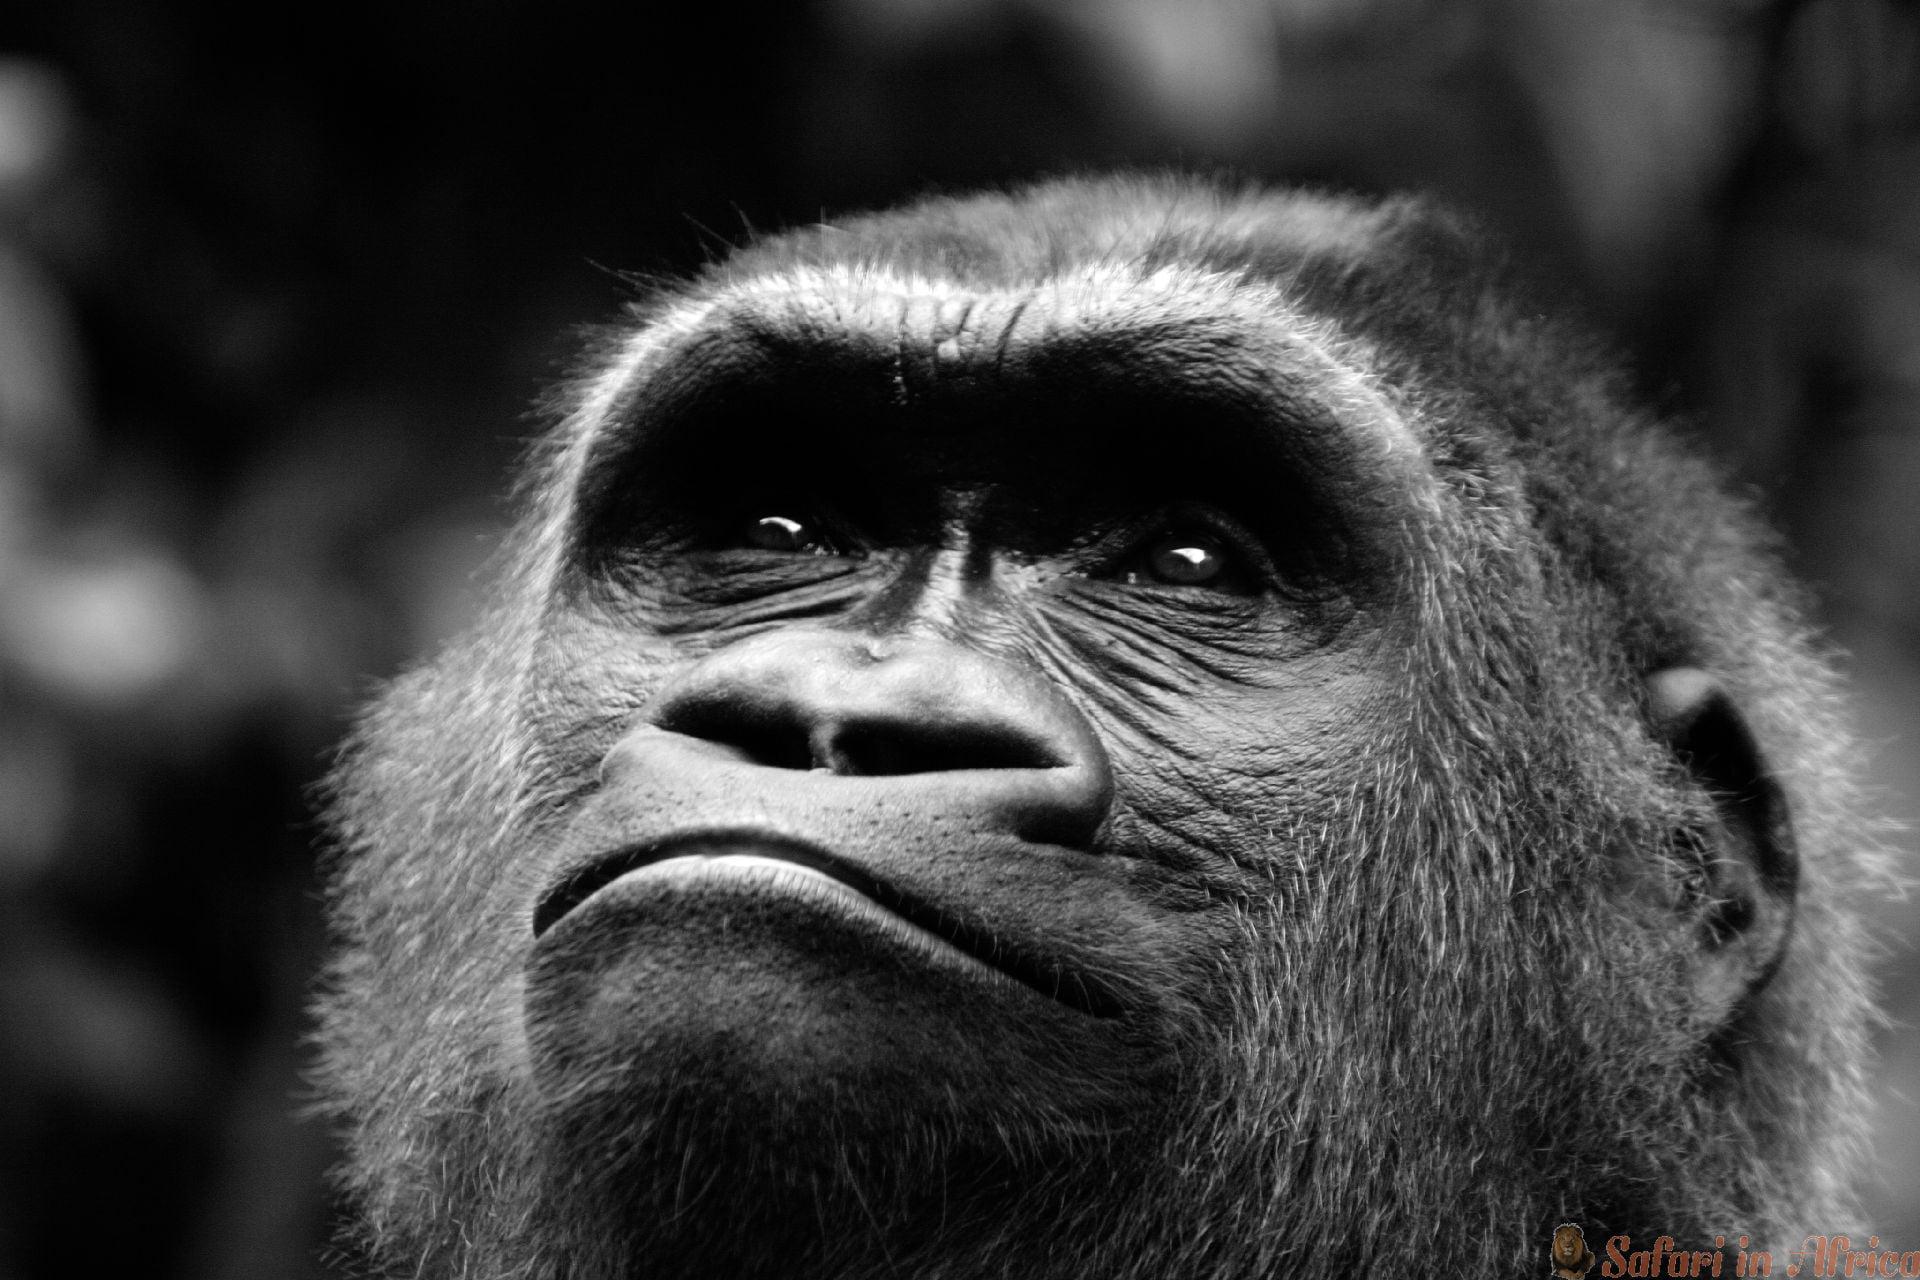 Gorilla close-up, Rwanda 2 B&W